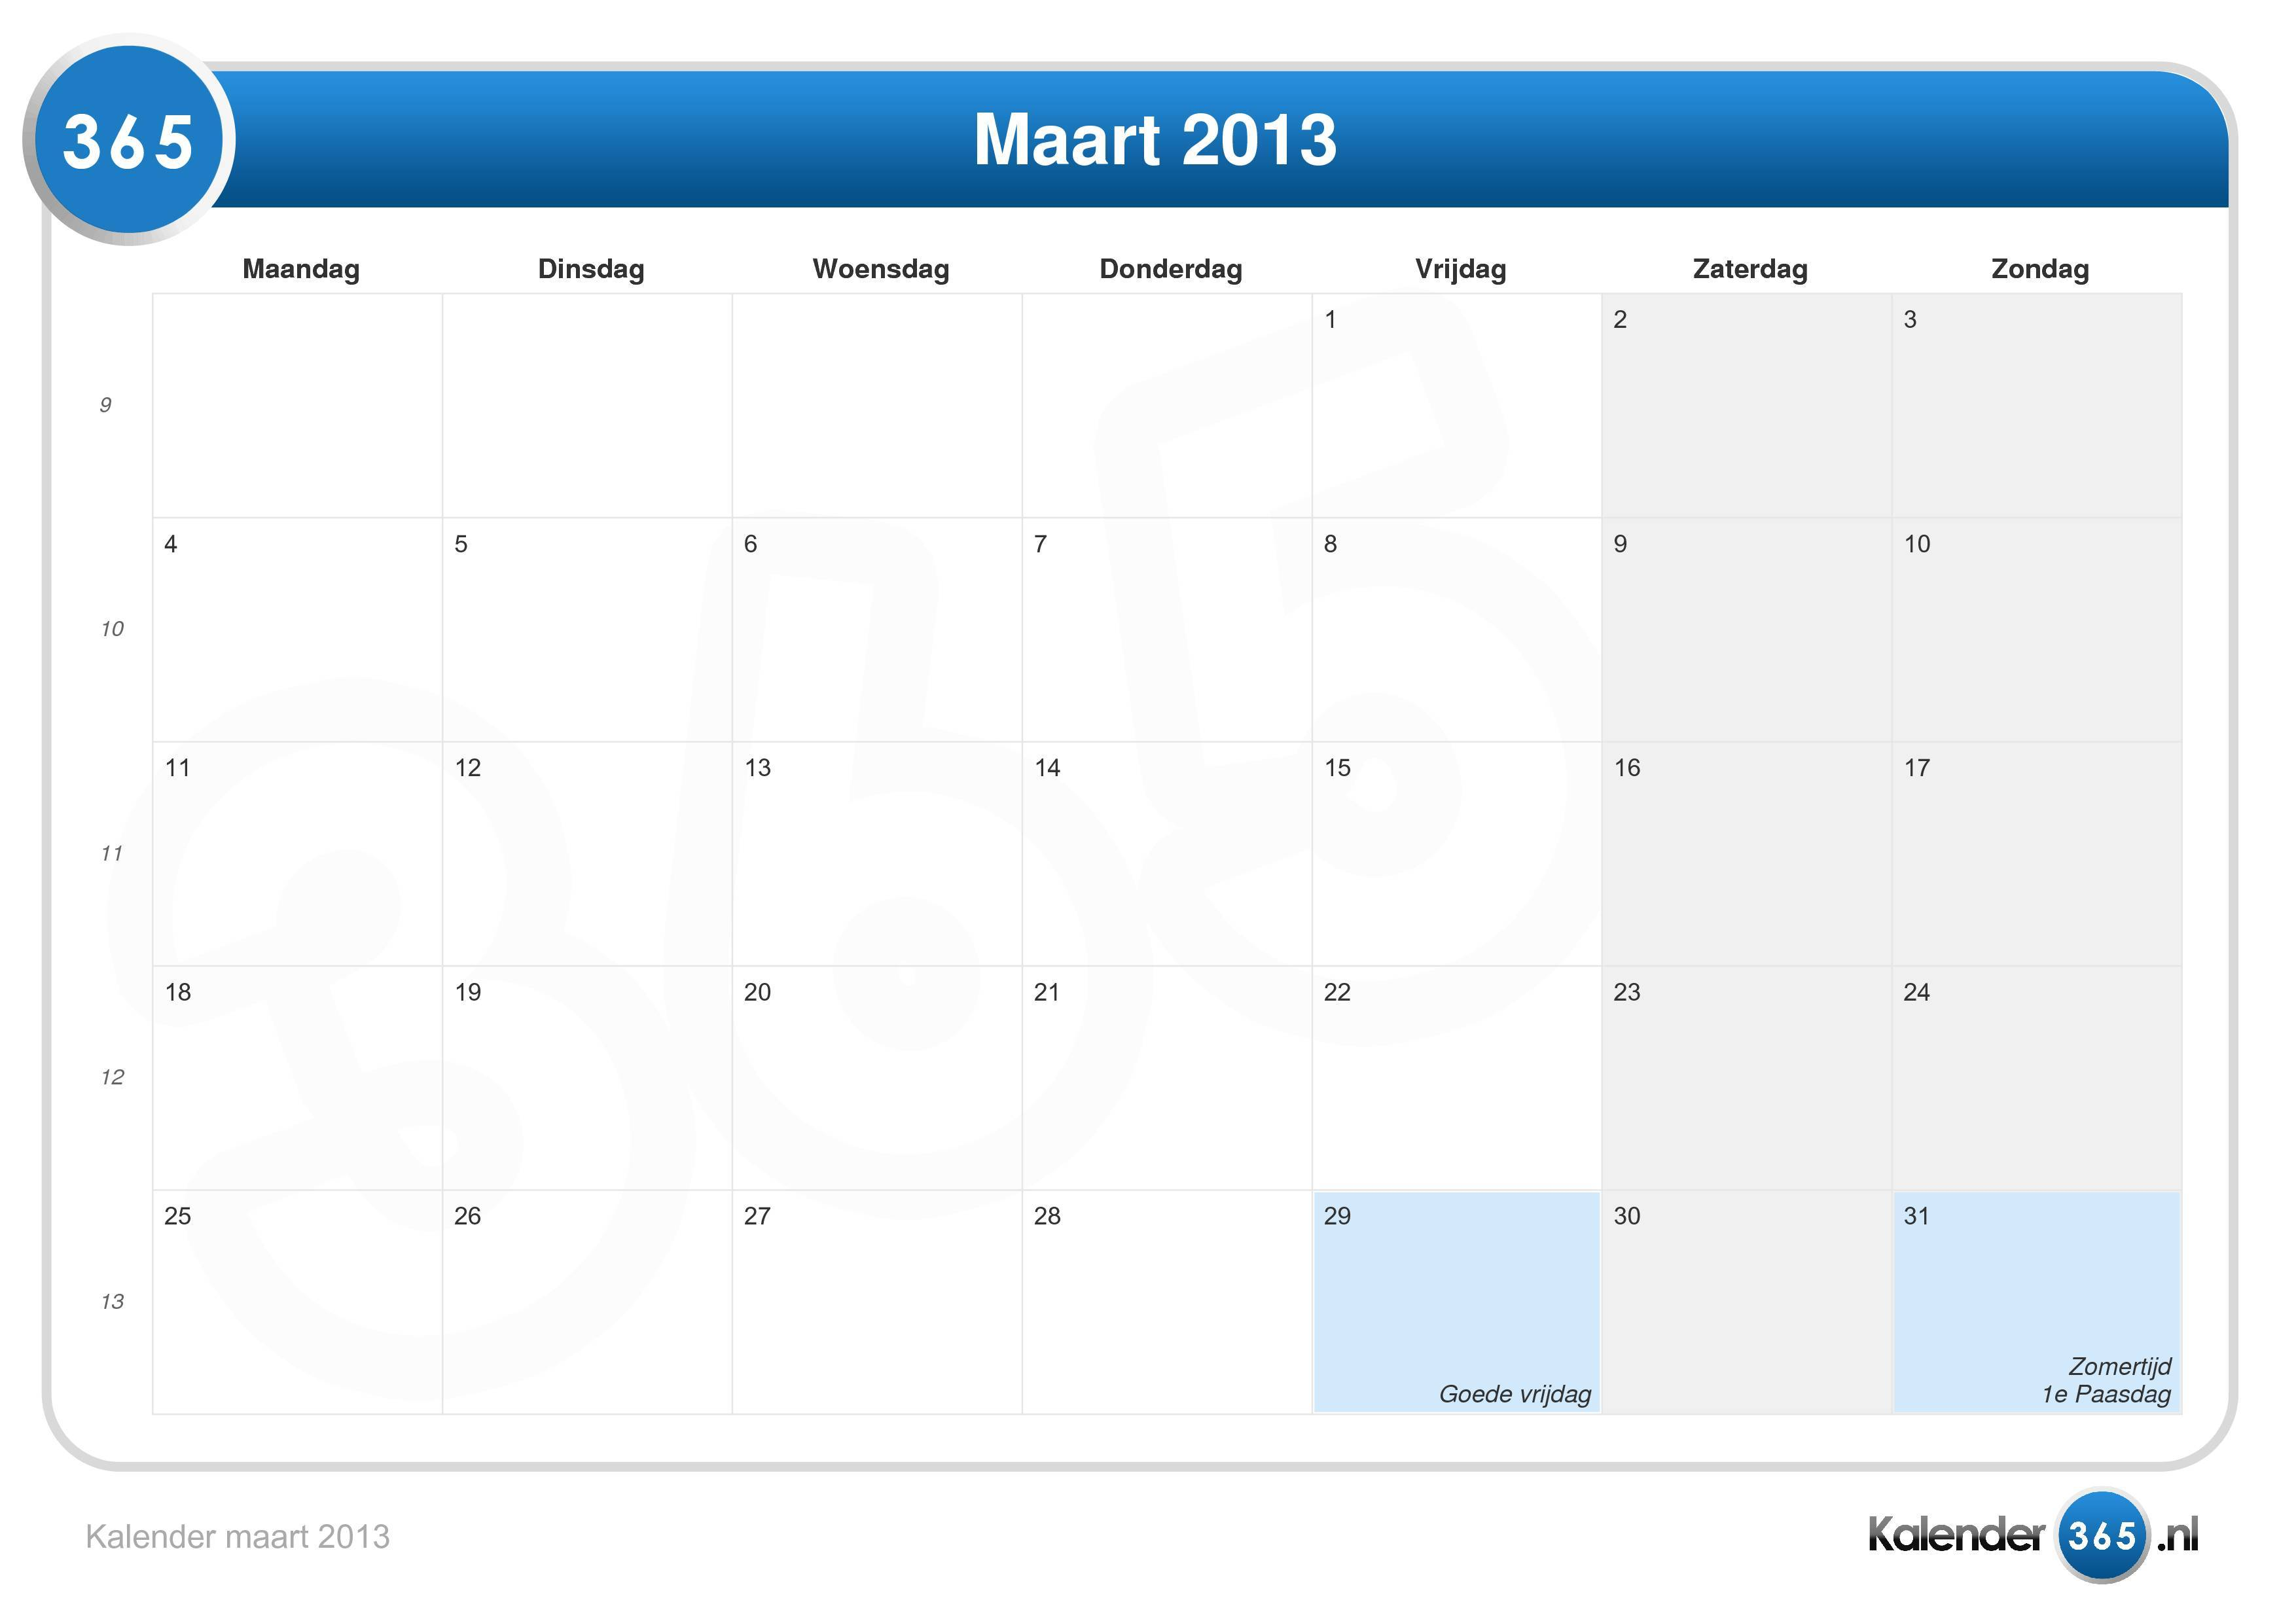 Kalender maart 2013